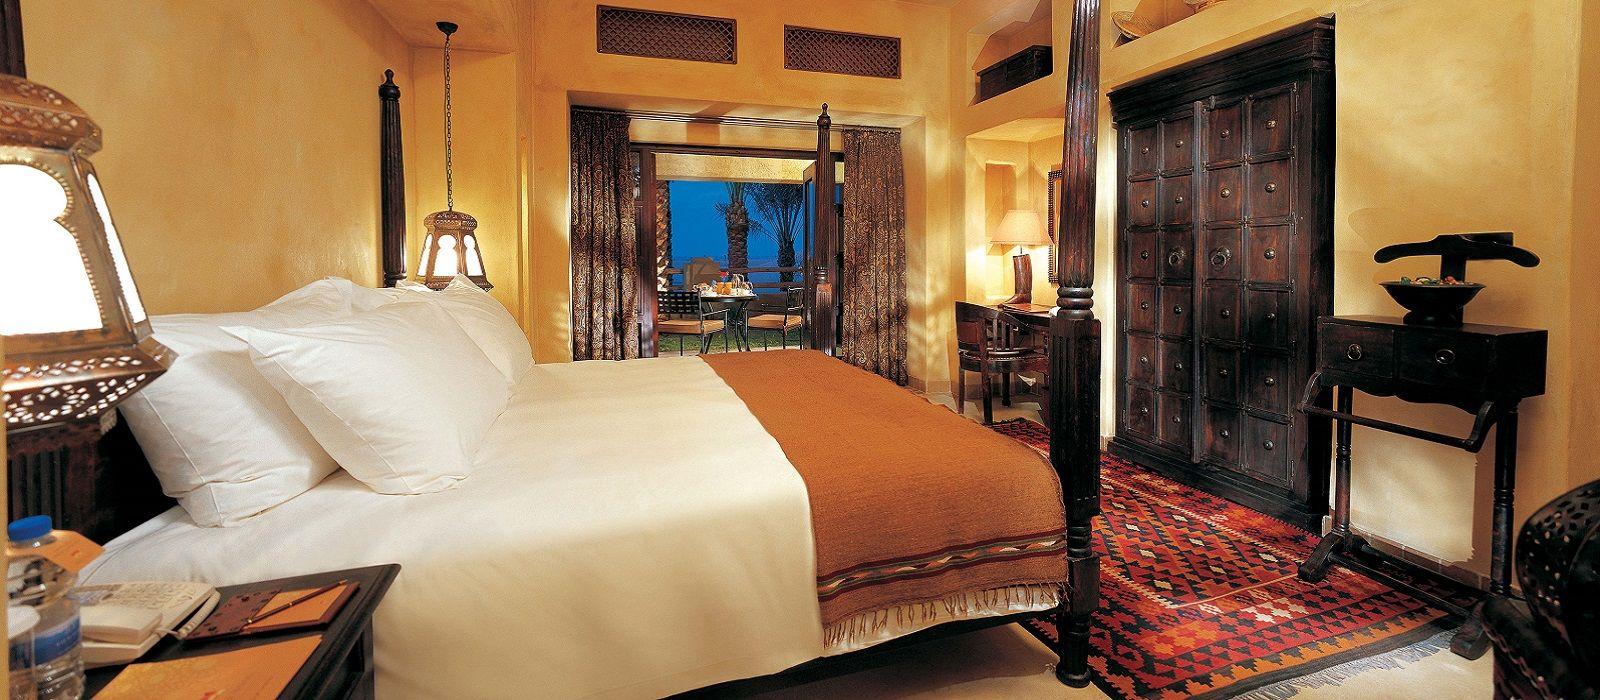 Bab Al Shams Desert Resort & Spa | Enchanting Travels